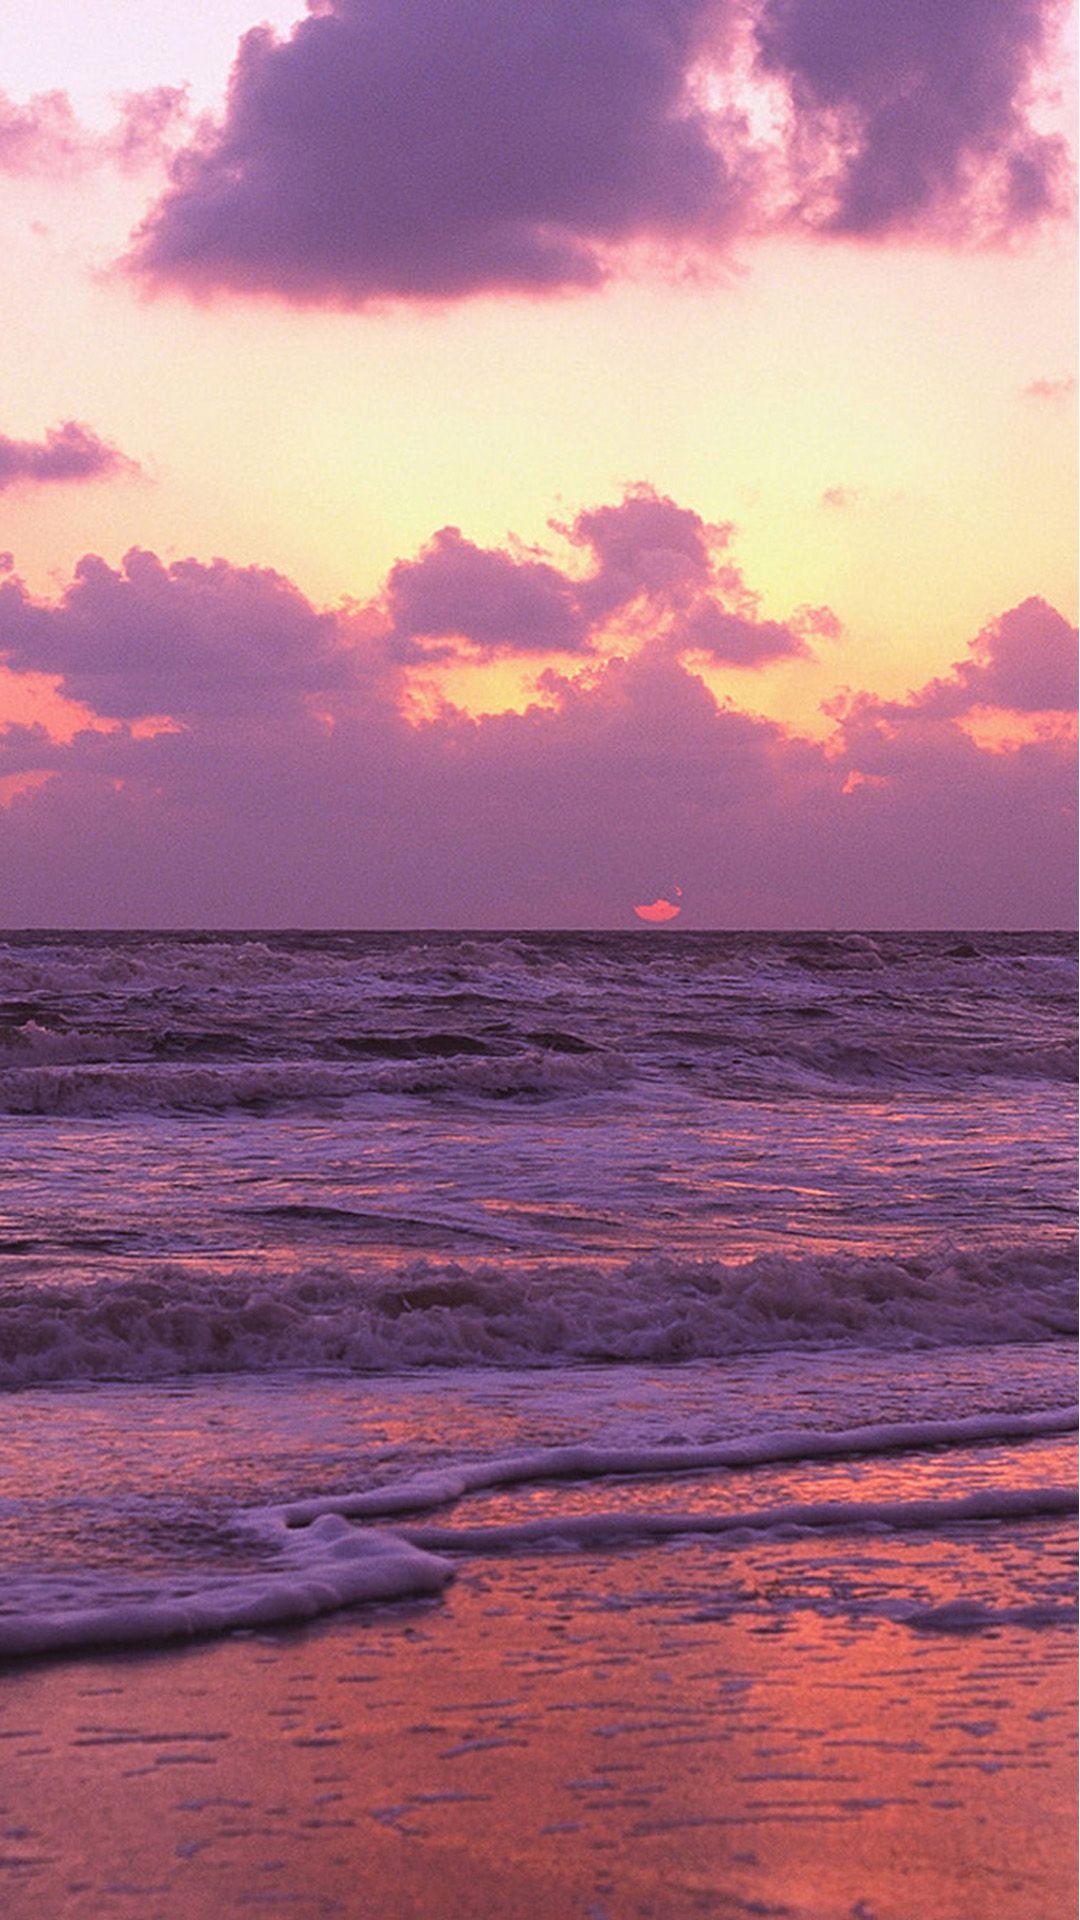 Beach Tumblr phone background